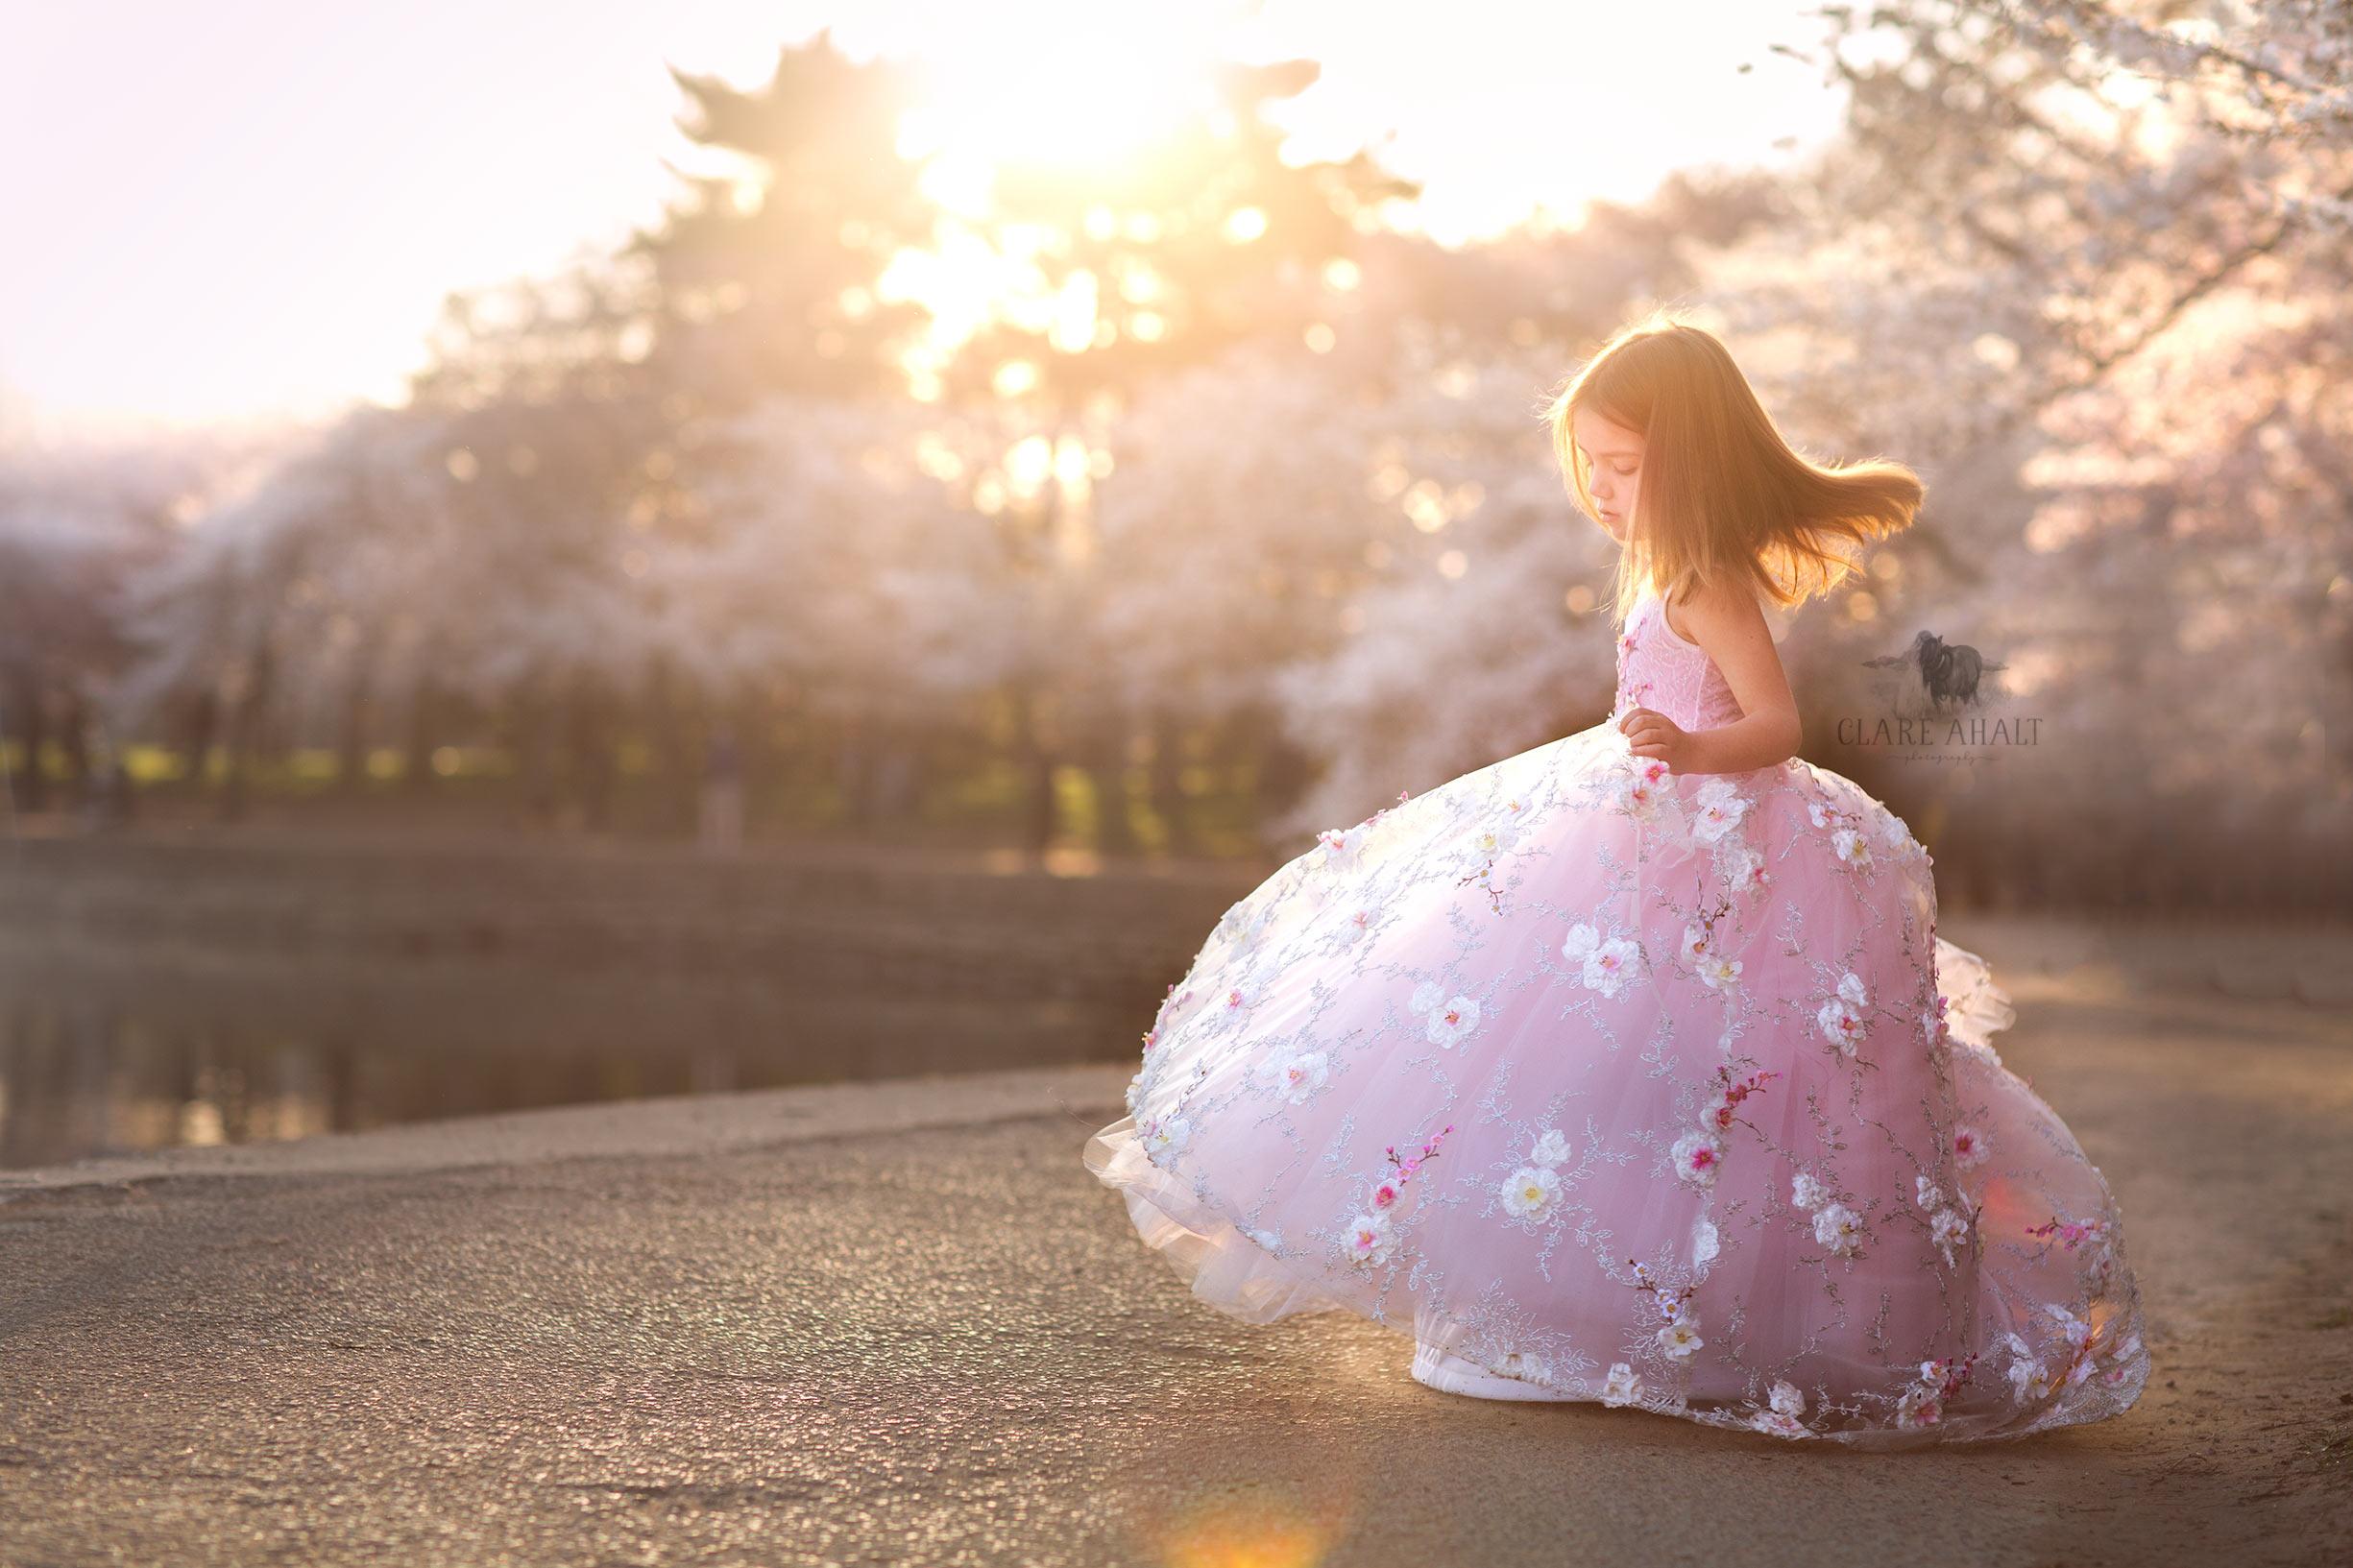 Clare Ahalt Photography   |  Washington DC, Virginia and Maryland Professional Portrait Photographer